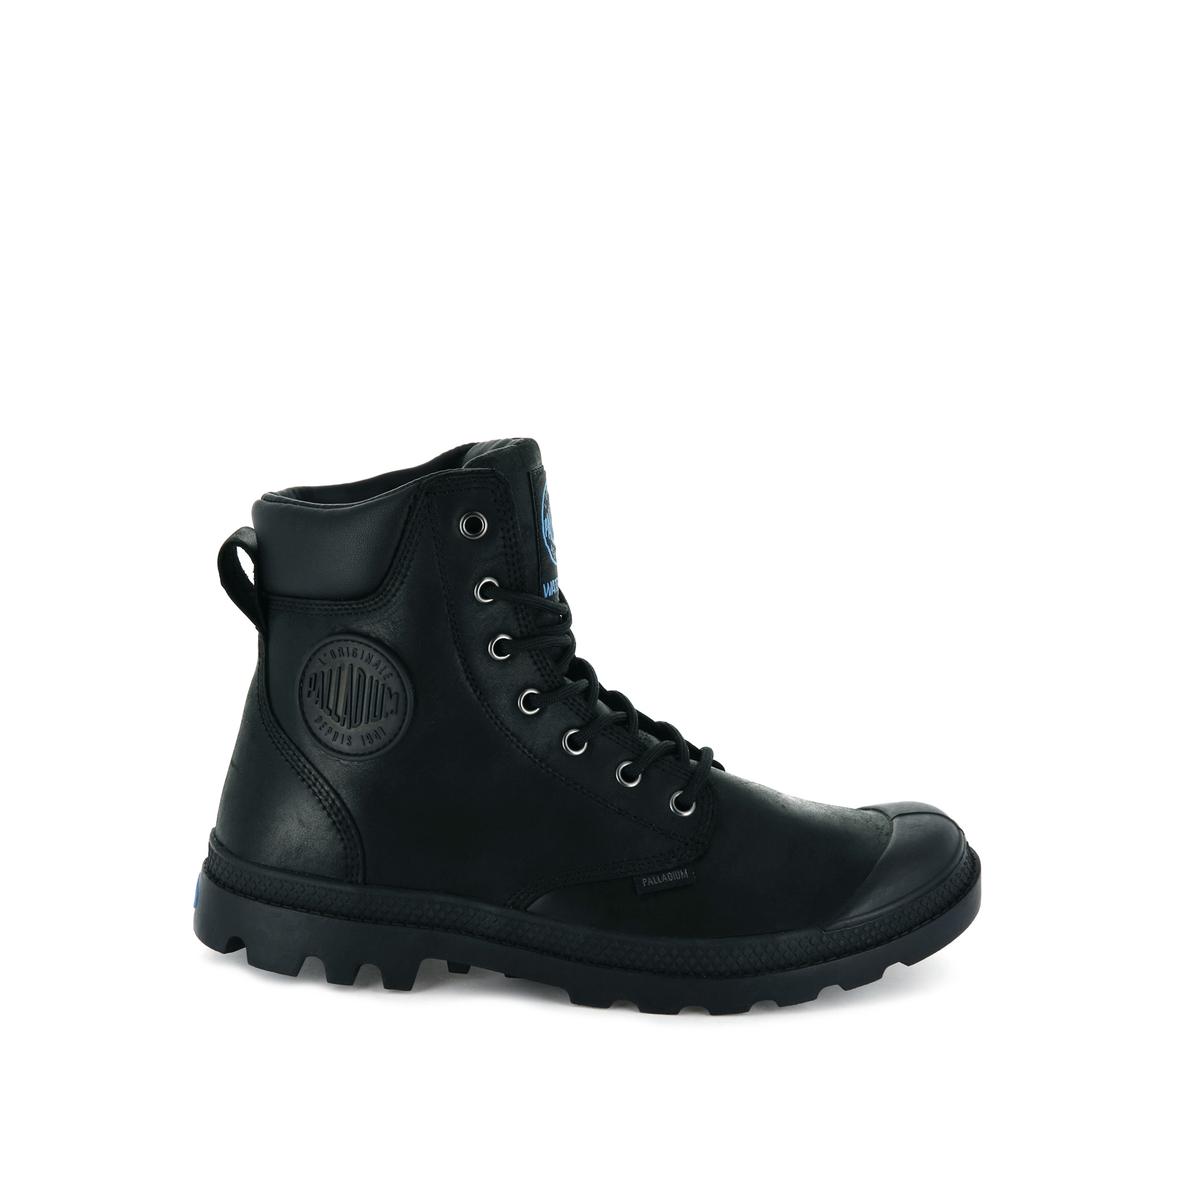 цена Ботинки La Redoute Кожаные Pampa Cuff WP LUX 36 черный онлайн в 2017 году